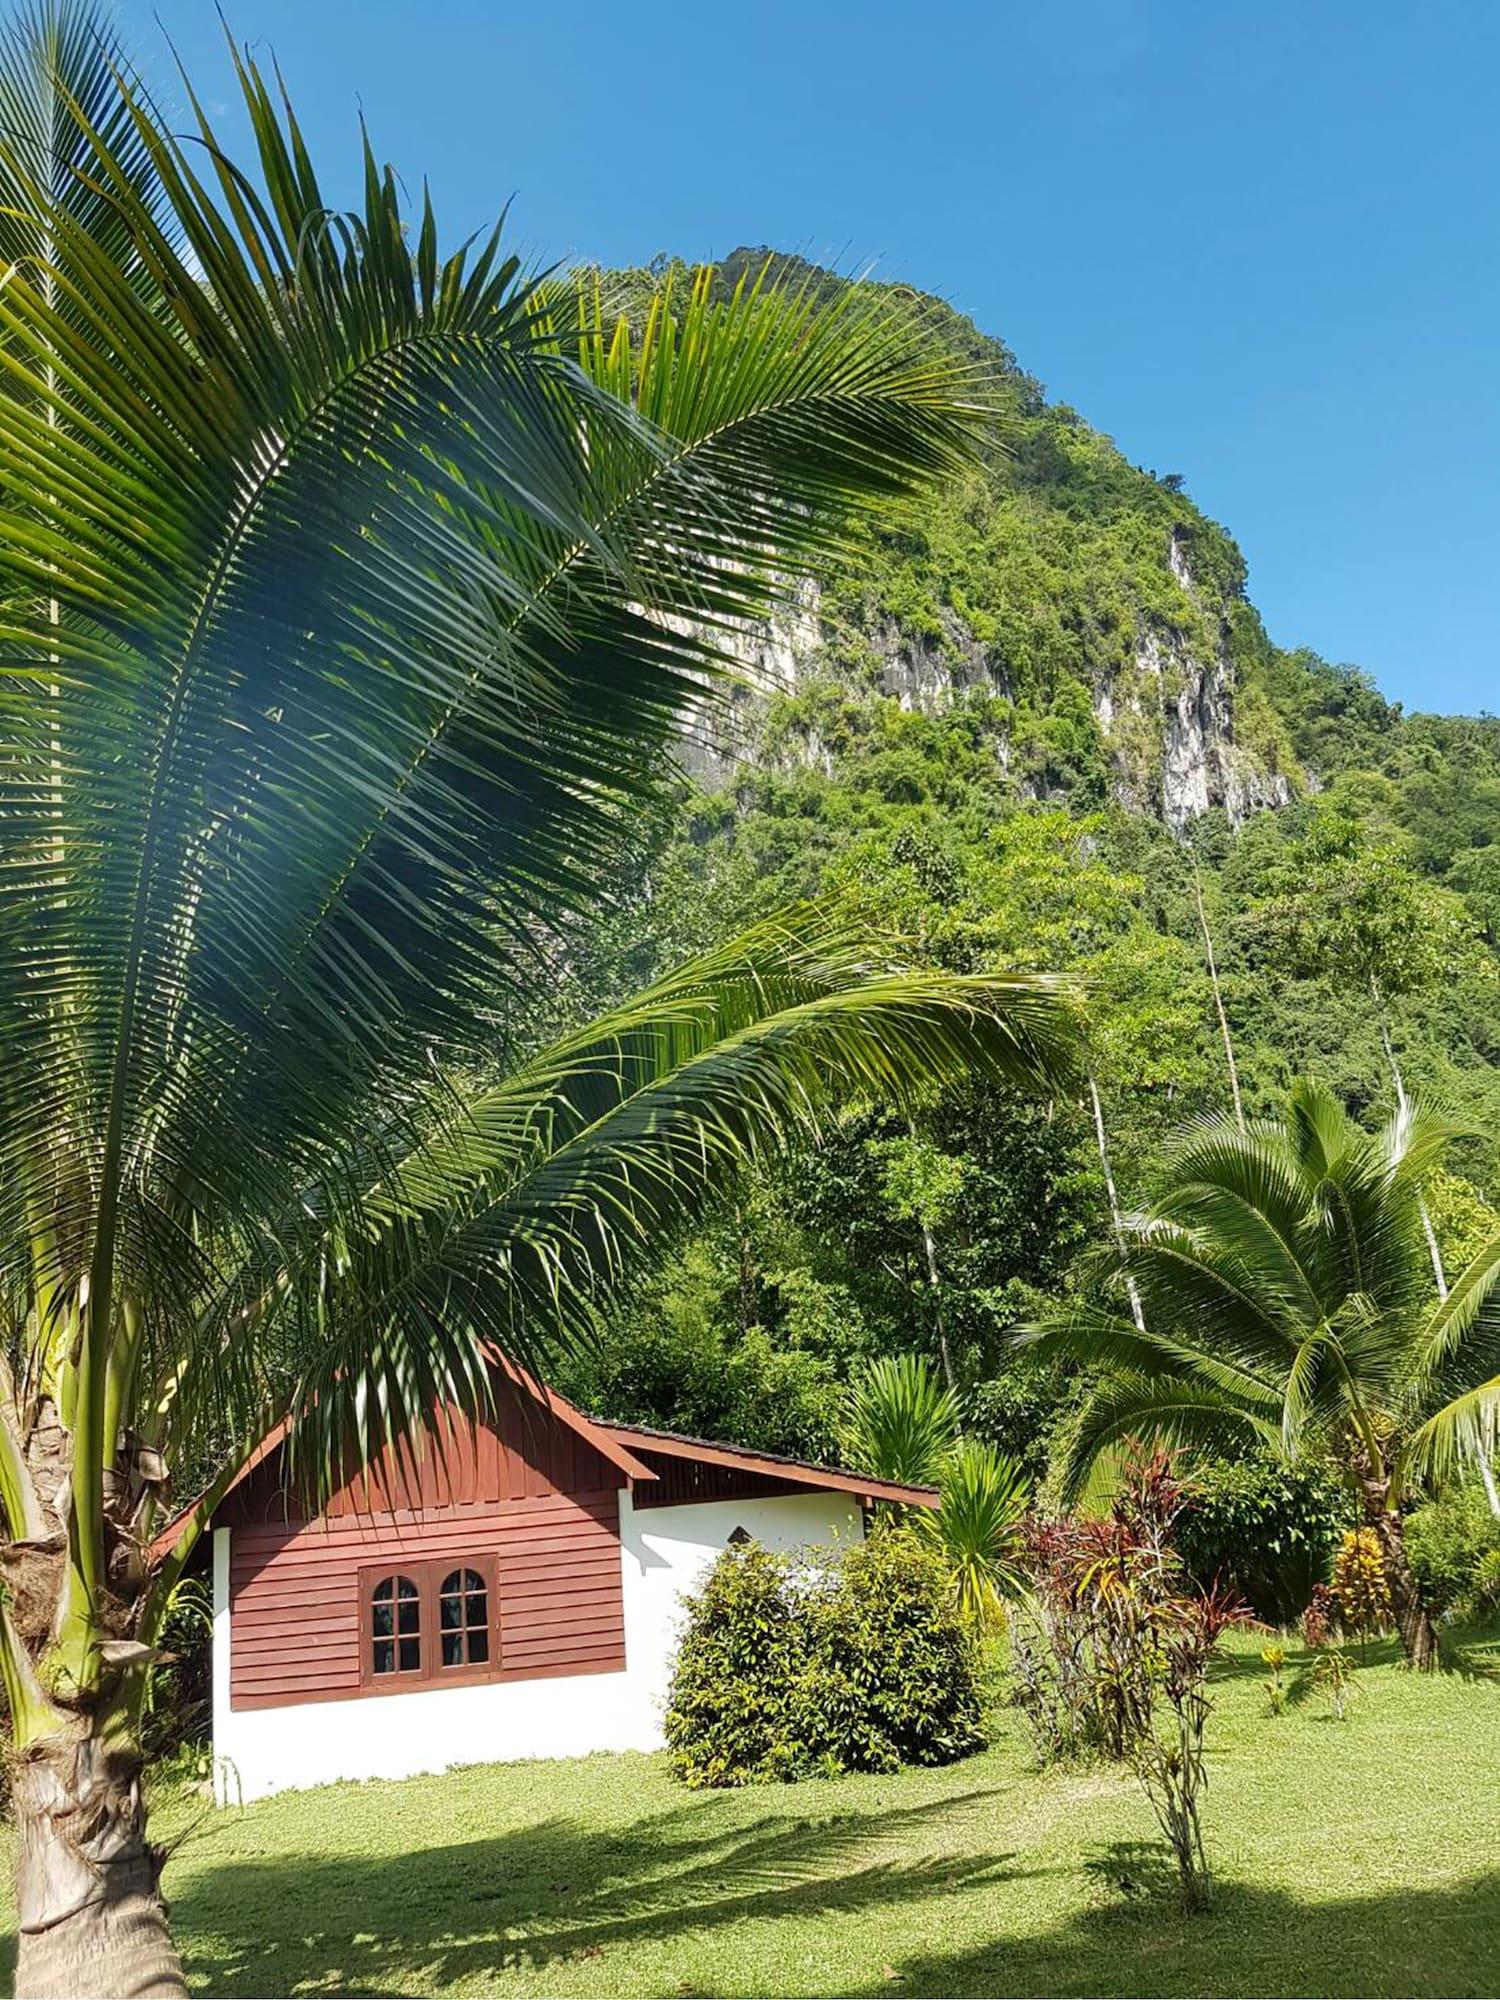 Phanom Bencha Mountain Resort, Muang Krabi